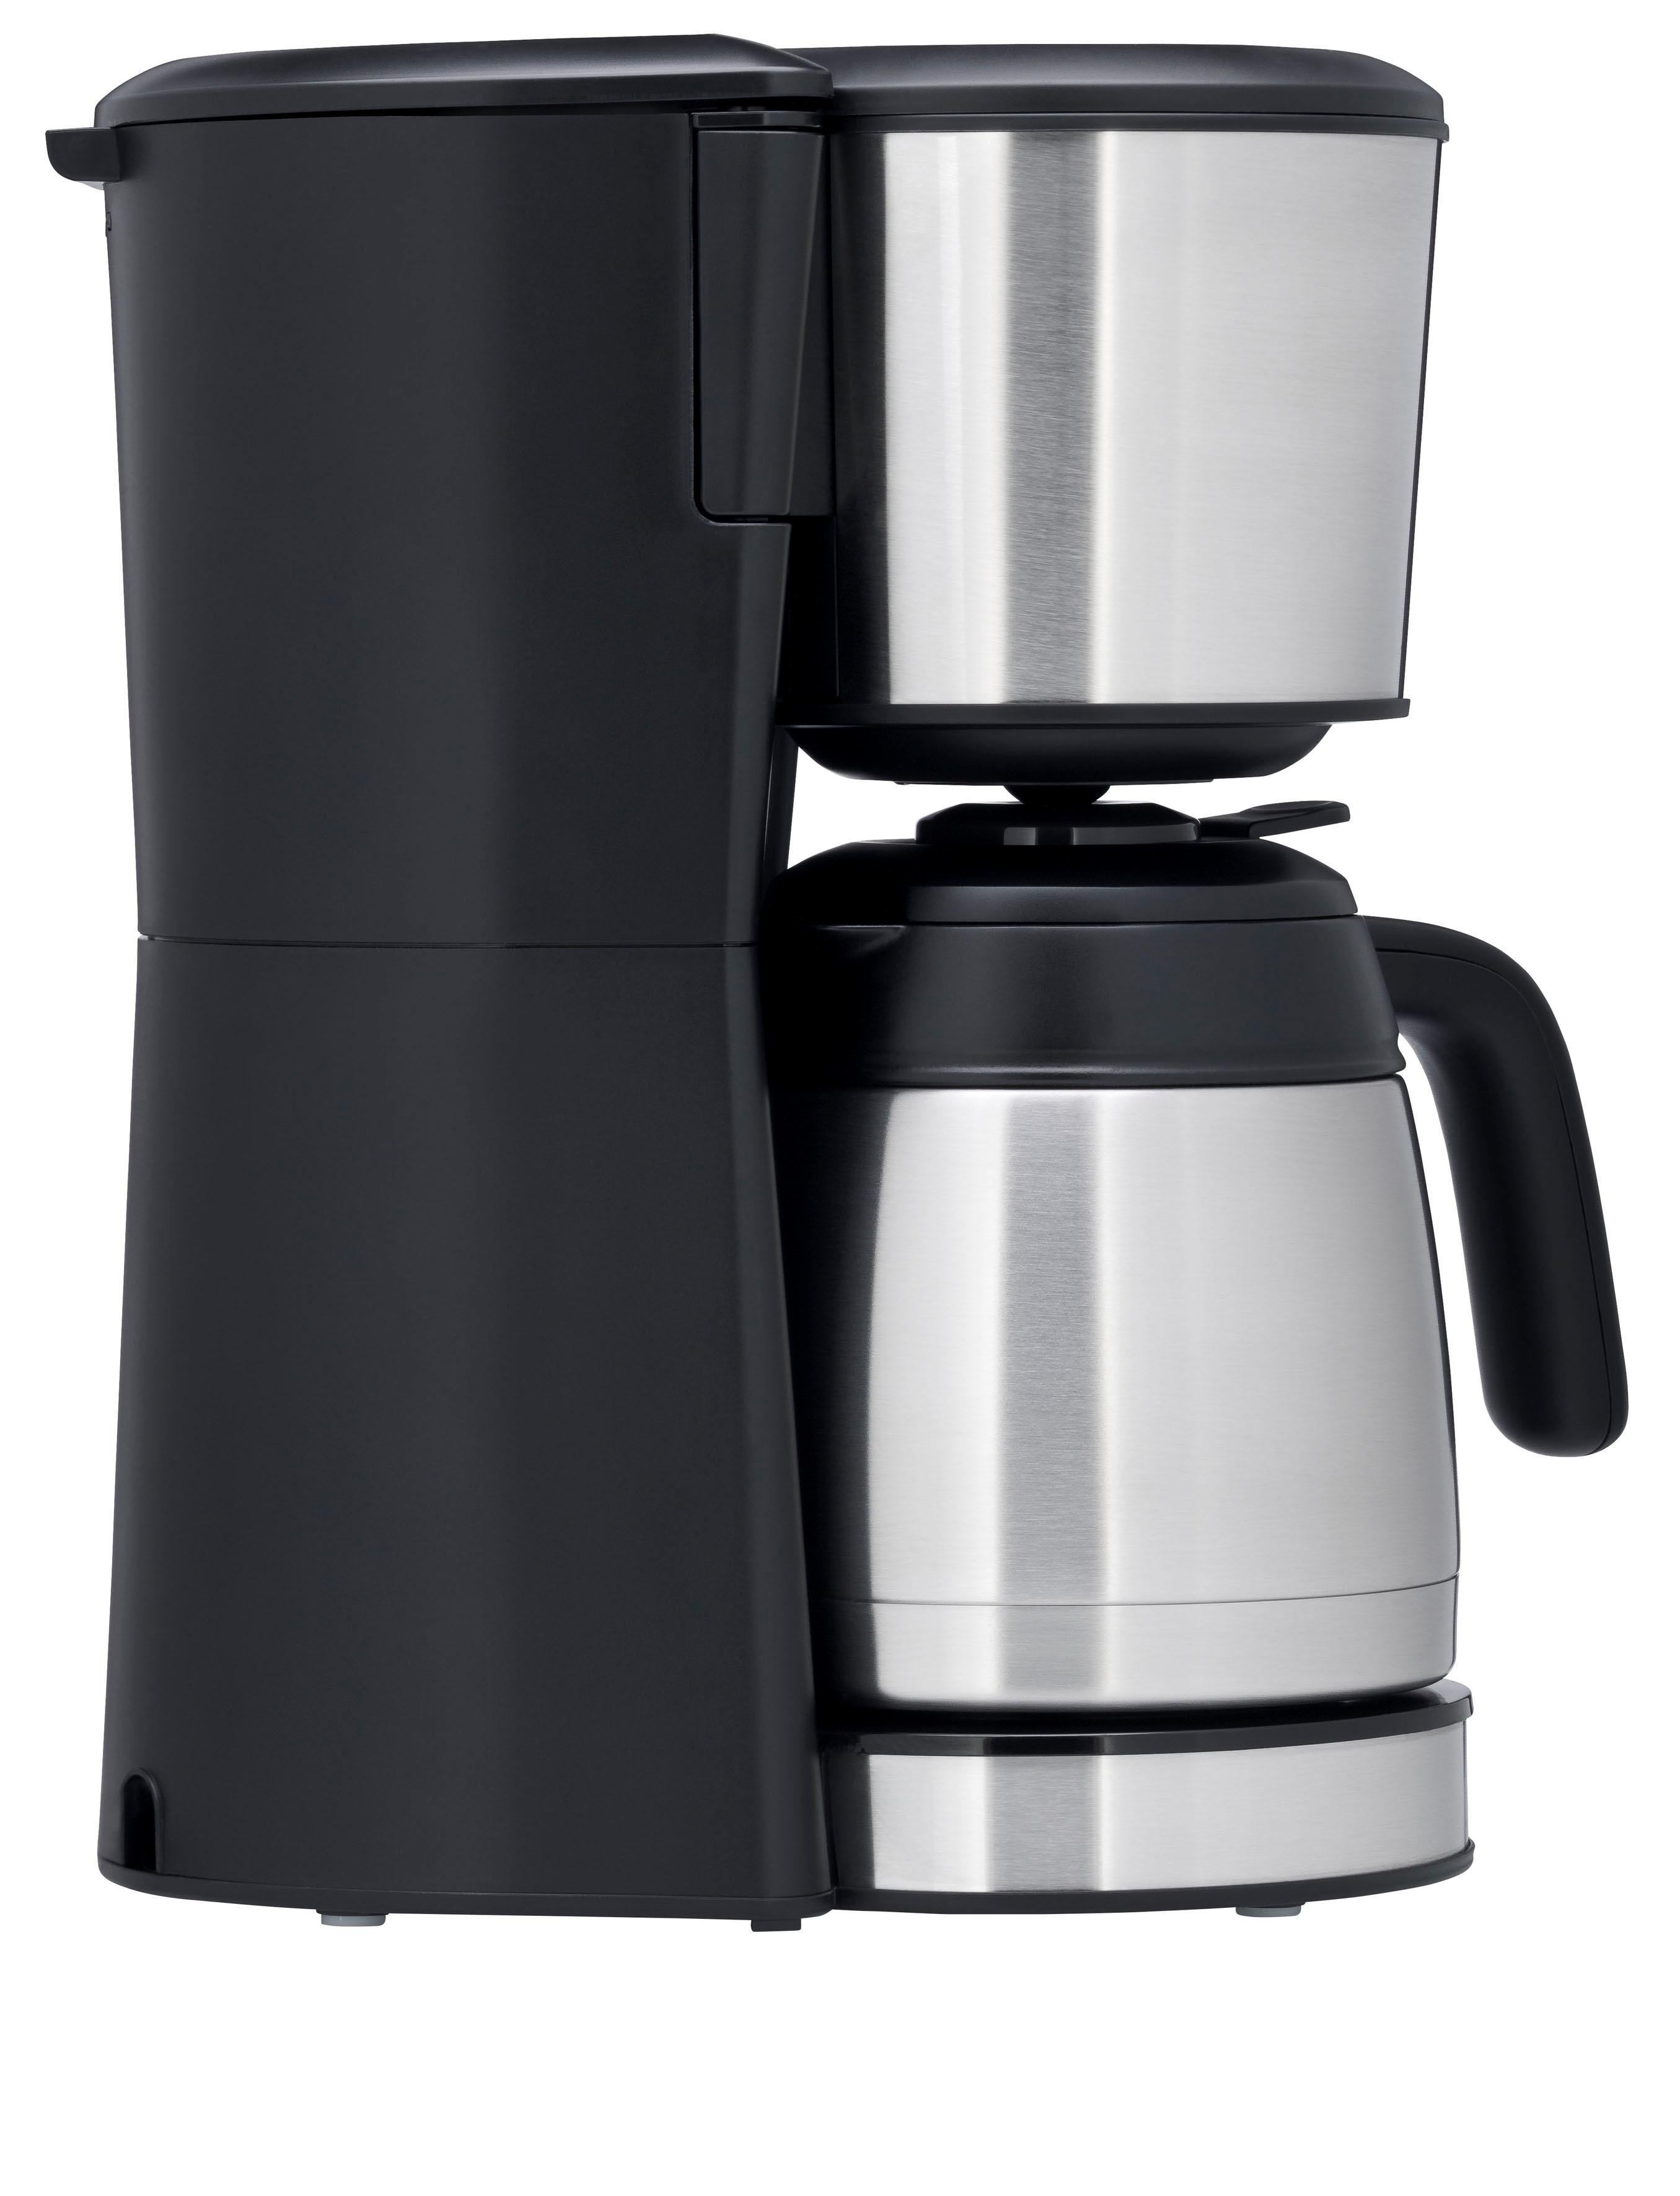 WMF koffiezetapparaat WMF Bueno Pro koffiezetapparaat Thermo, papieren filter 1x4 online kopen op otto.nl